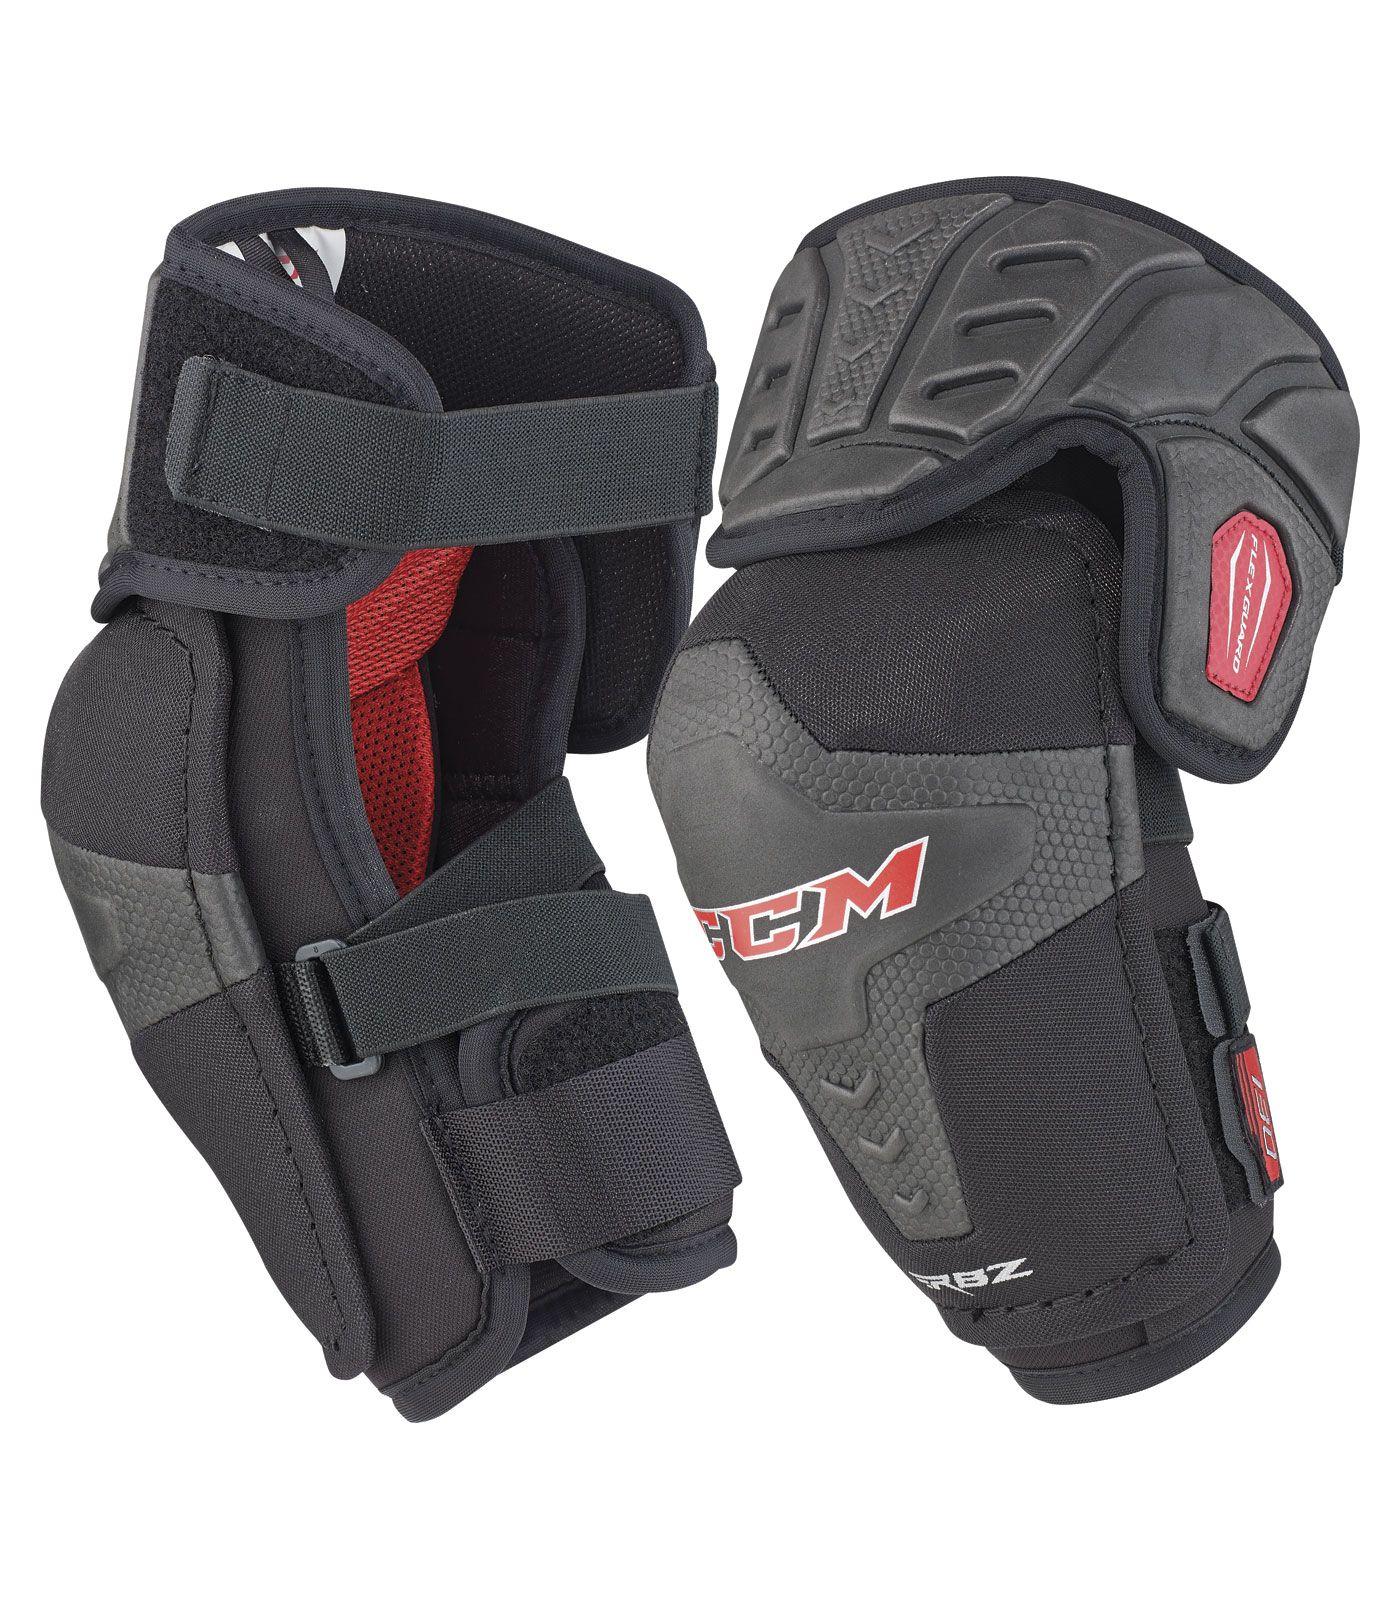 Ccm Rbz 130 Equipment Hockey Elbow Pads Sports Experts Medium Hockey Elbow Pads Elbow Pads Hockey Gloves